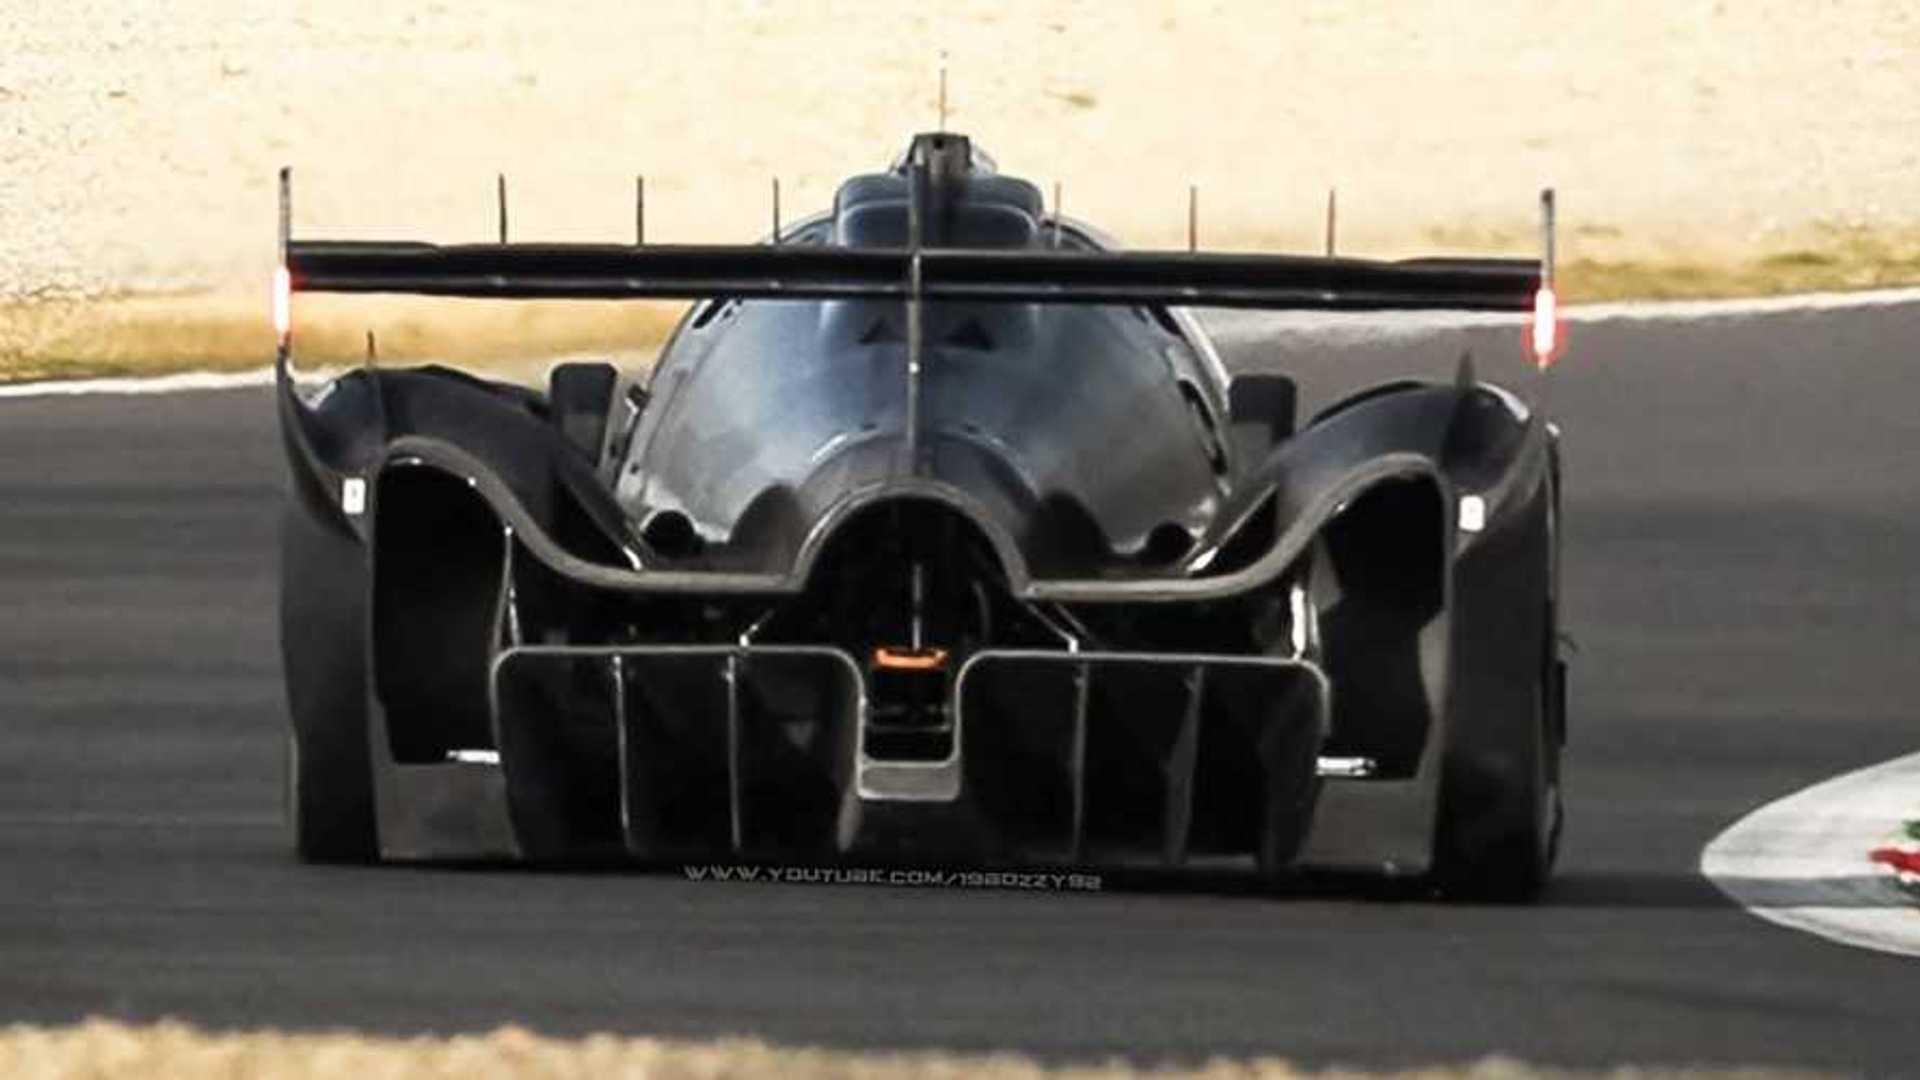 Гиперкар Glickenhaus Le Mans прошел испытания в Монце